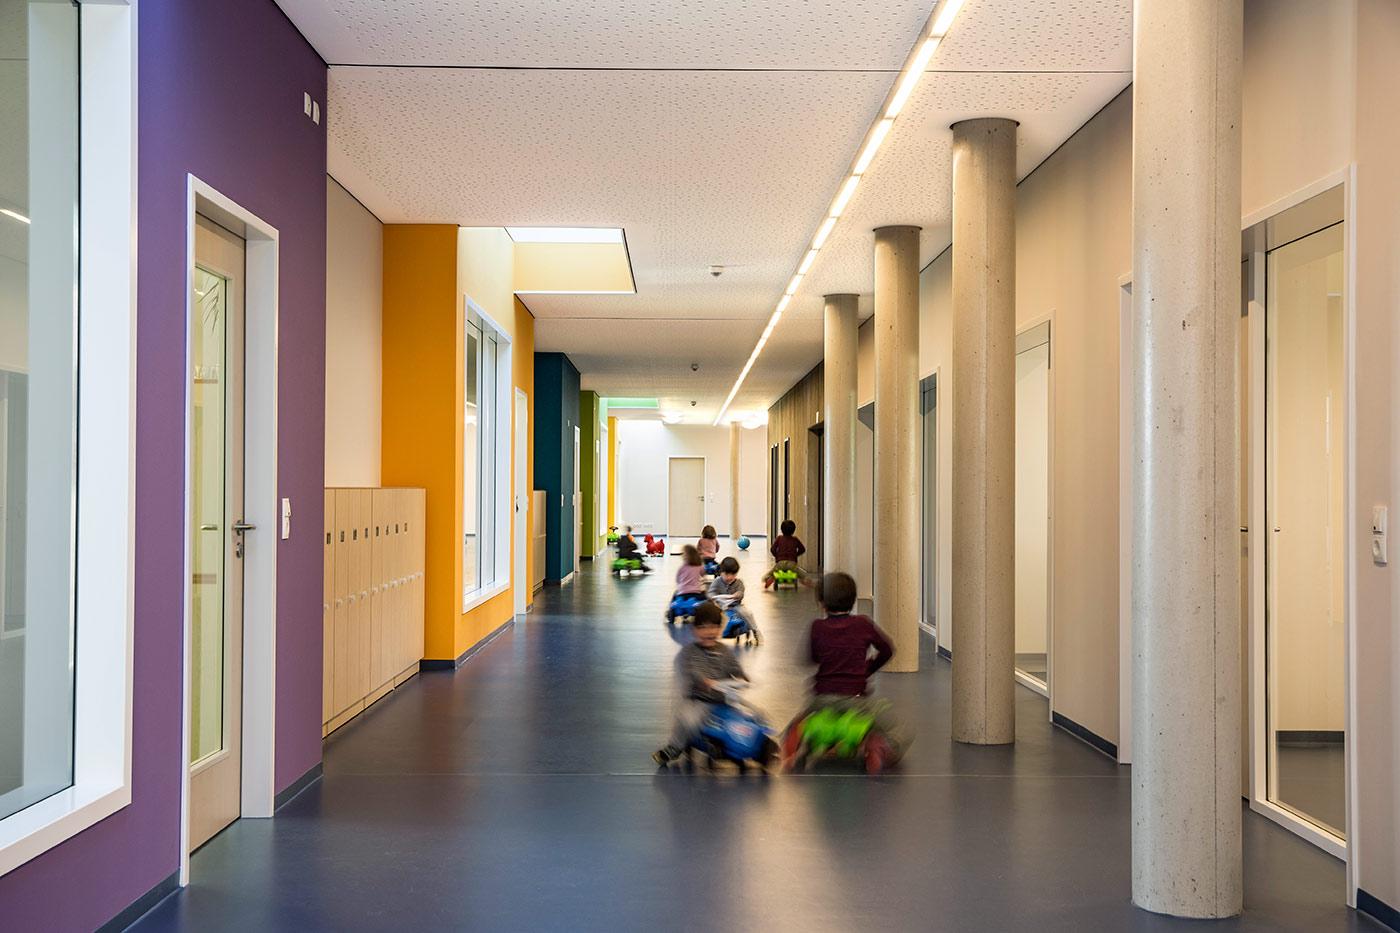 Fotograf Architektur Kita Neuwied  Bonn Kln  Tobias Vollmer Fotografie